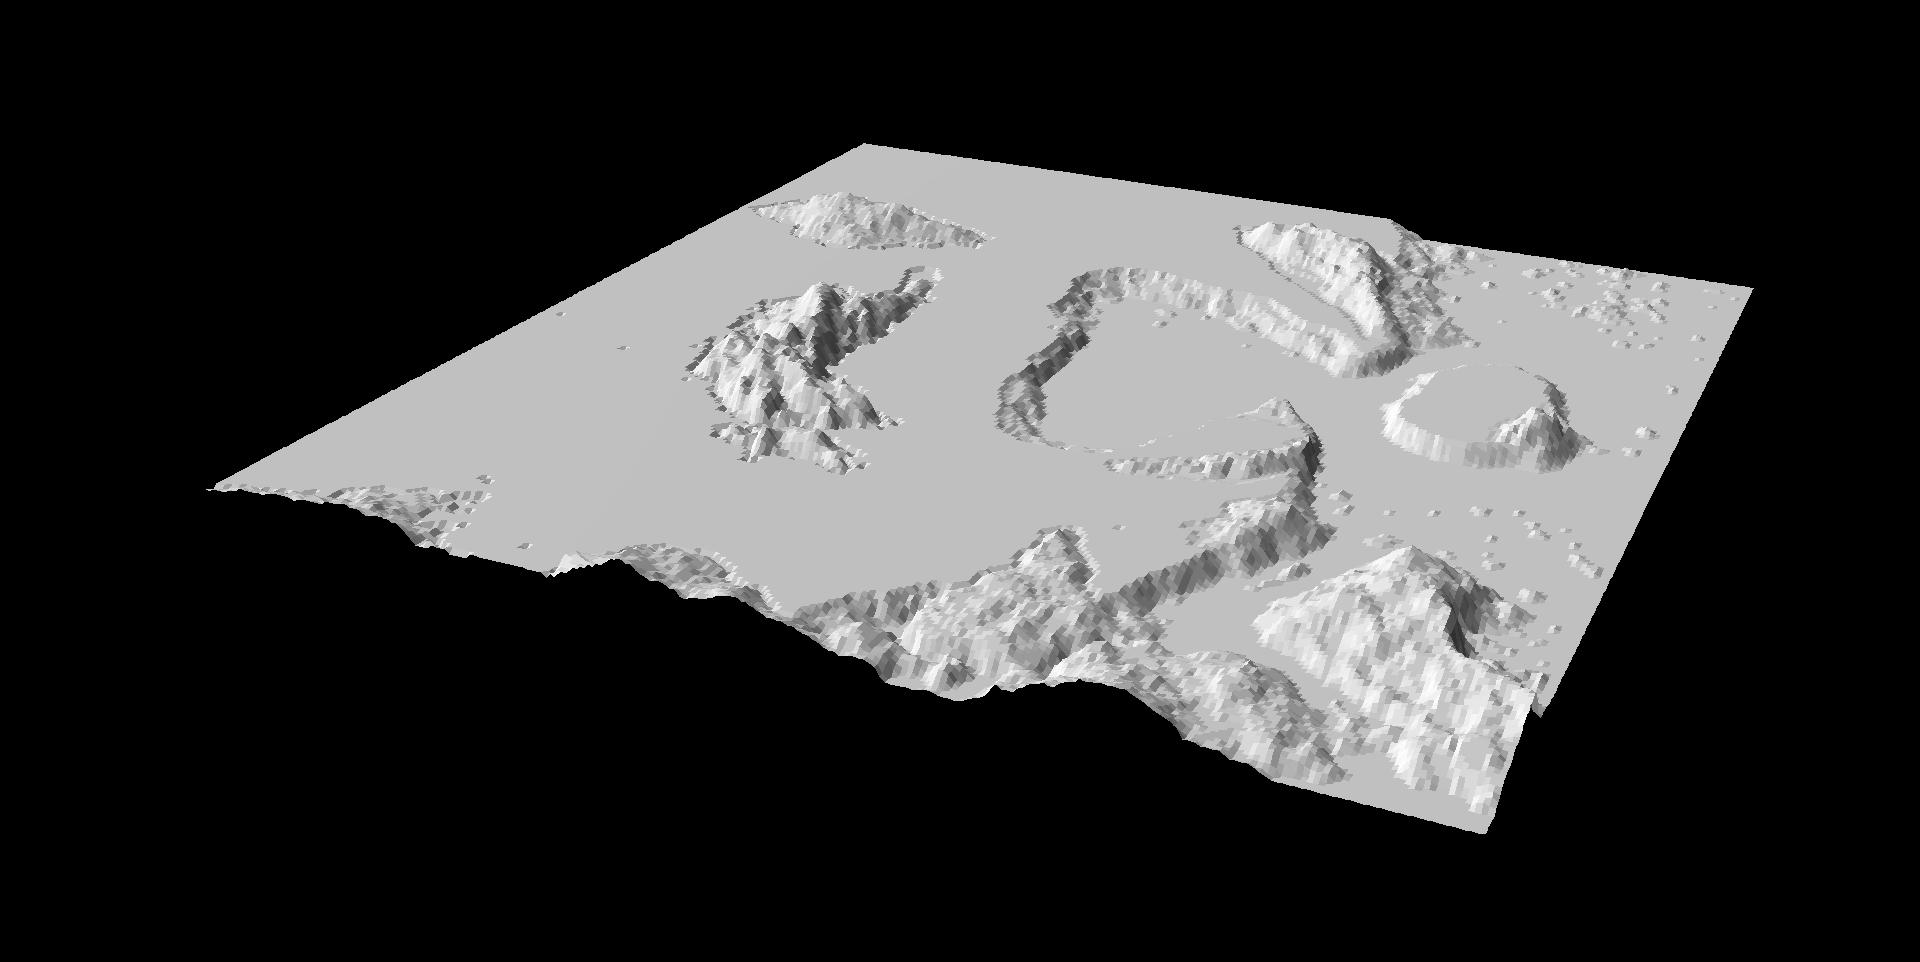 https://neorail.jp/forum/uploads/map_akari_init_heightmap_R_0.5_0621-1700_elv.png